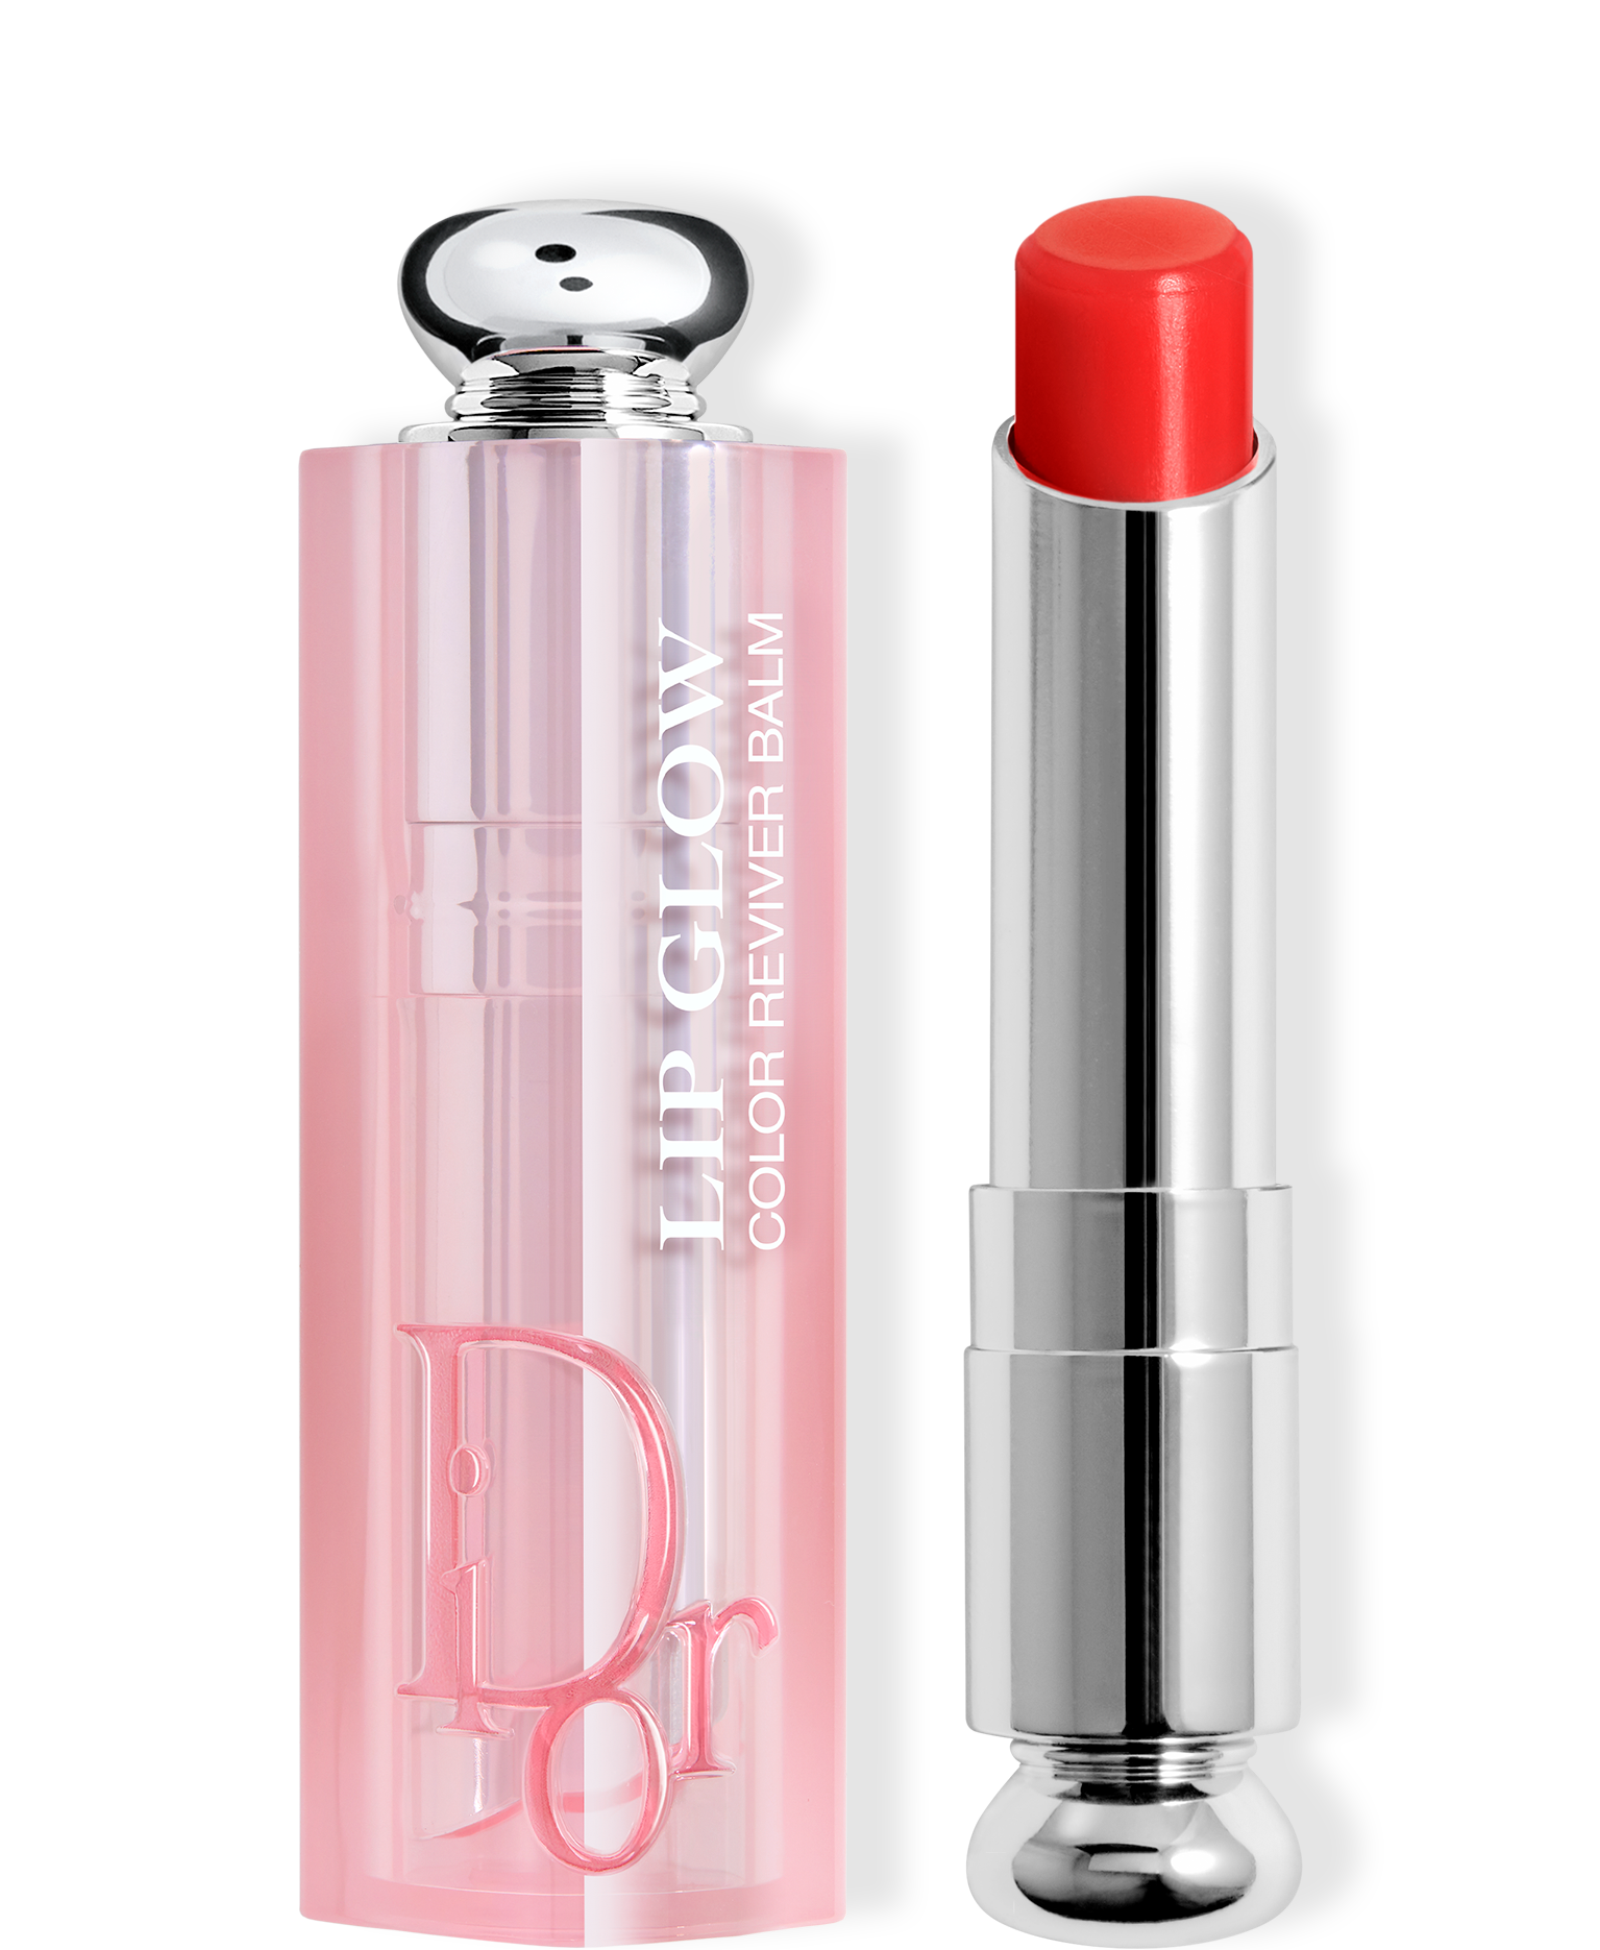 DIOR Addict Lip Glow Balm, 015 cherry